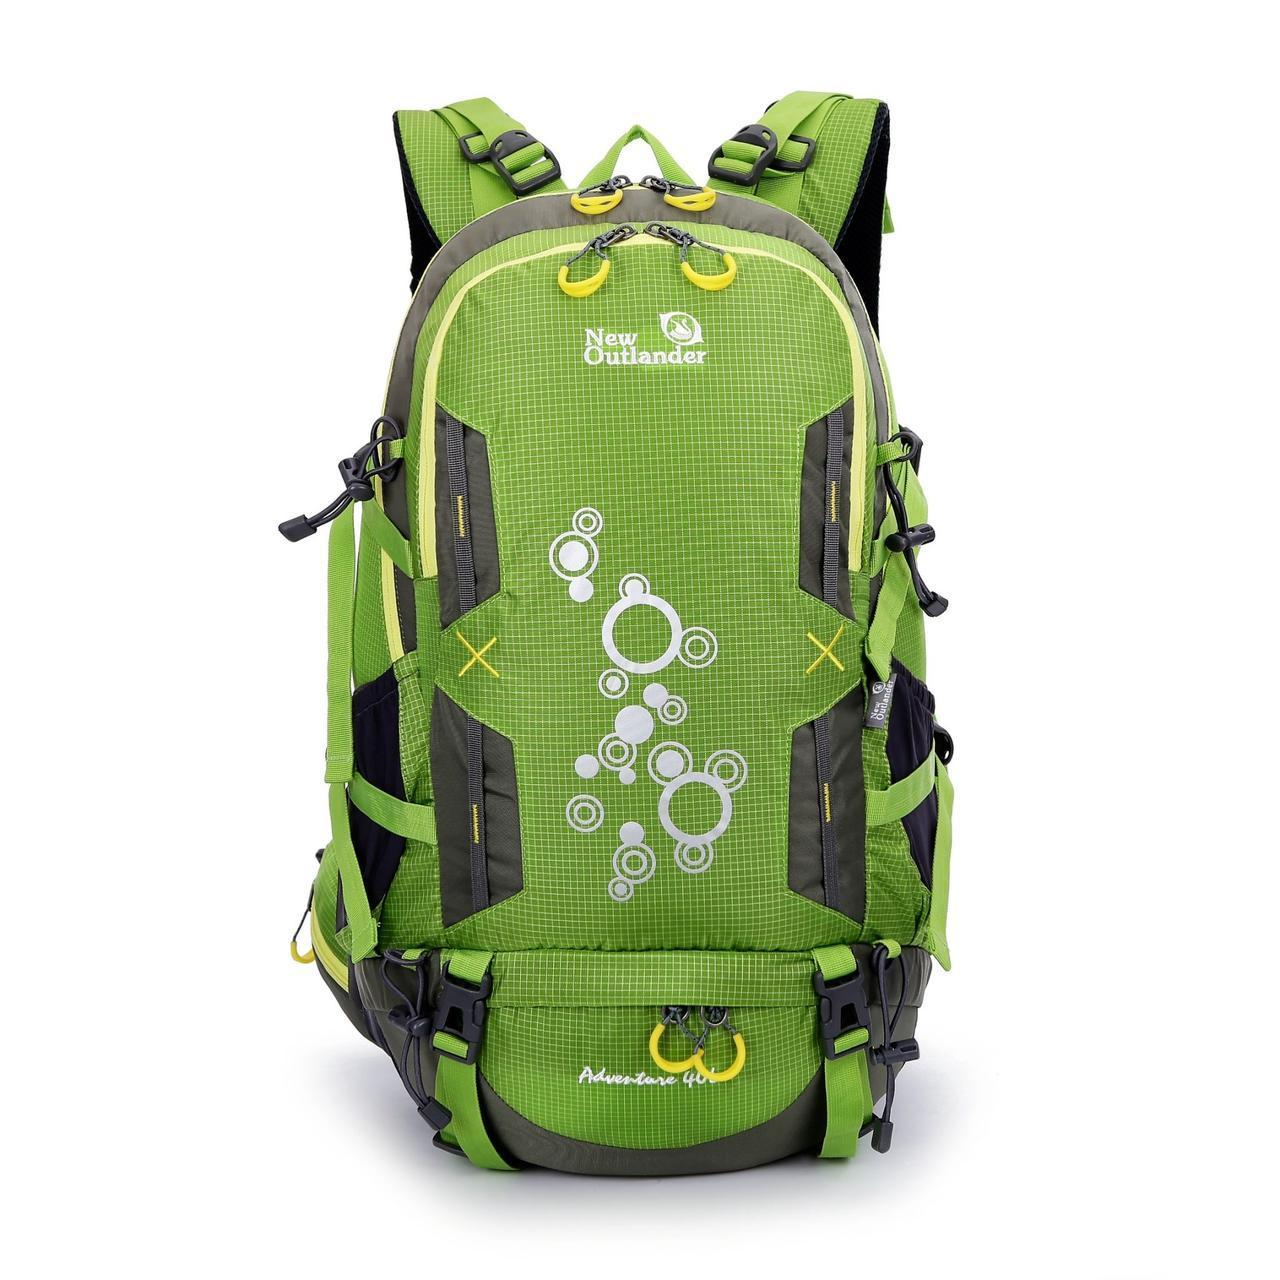 Рюкзак туристичний New Outlander 40 л - зеленый(AV 1217)